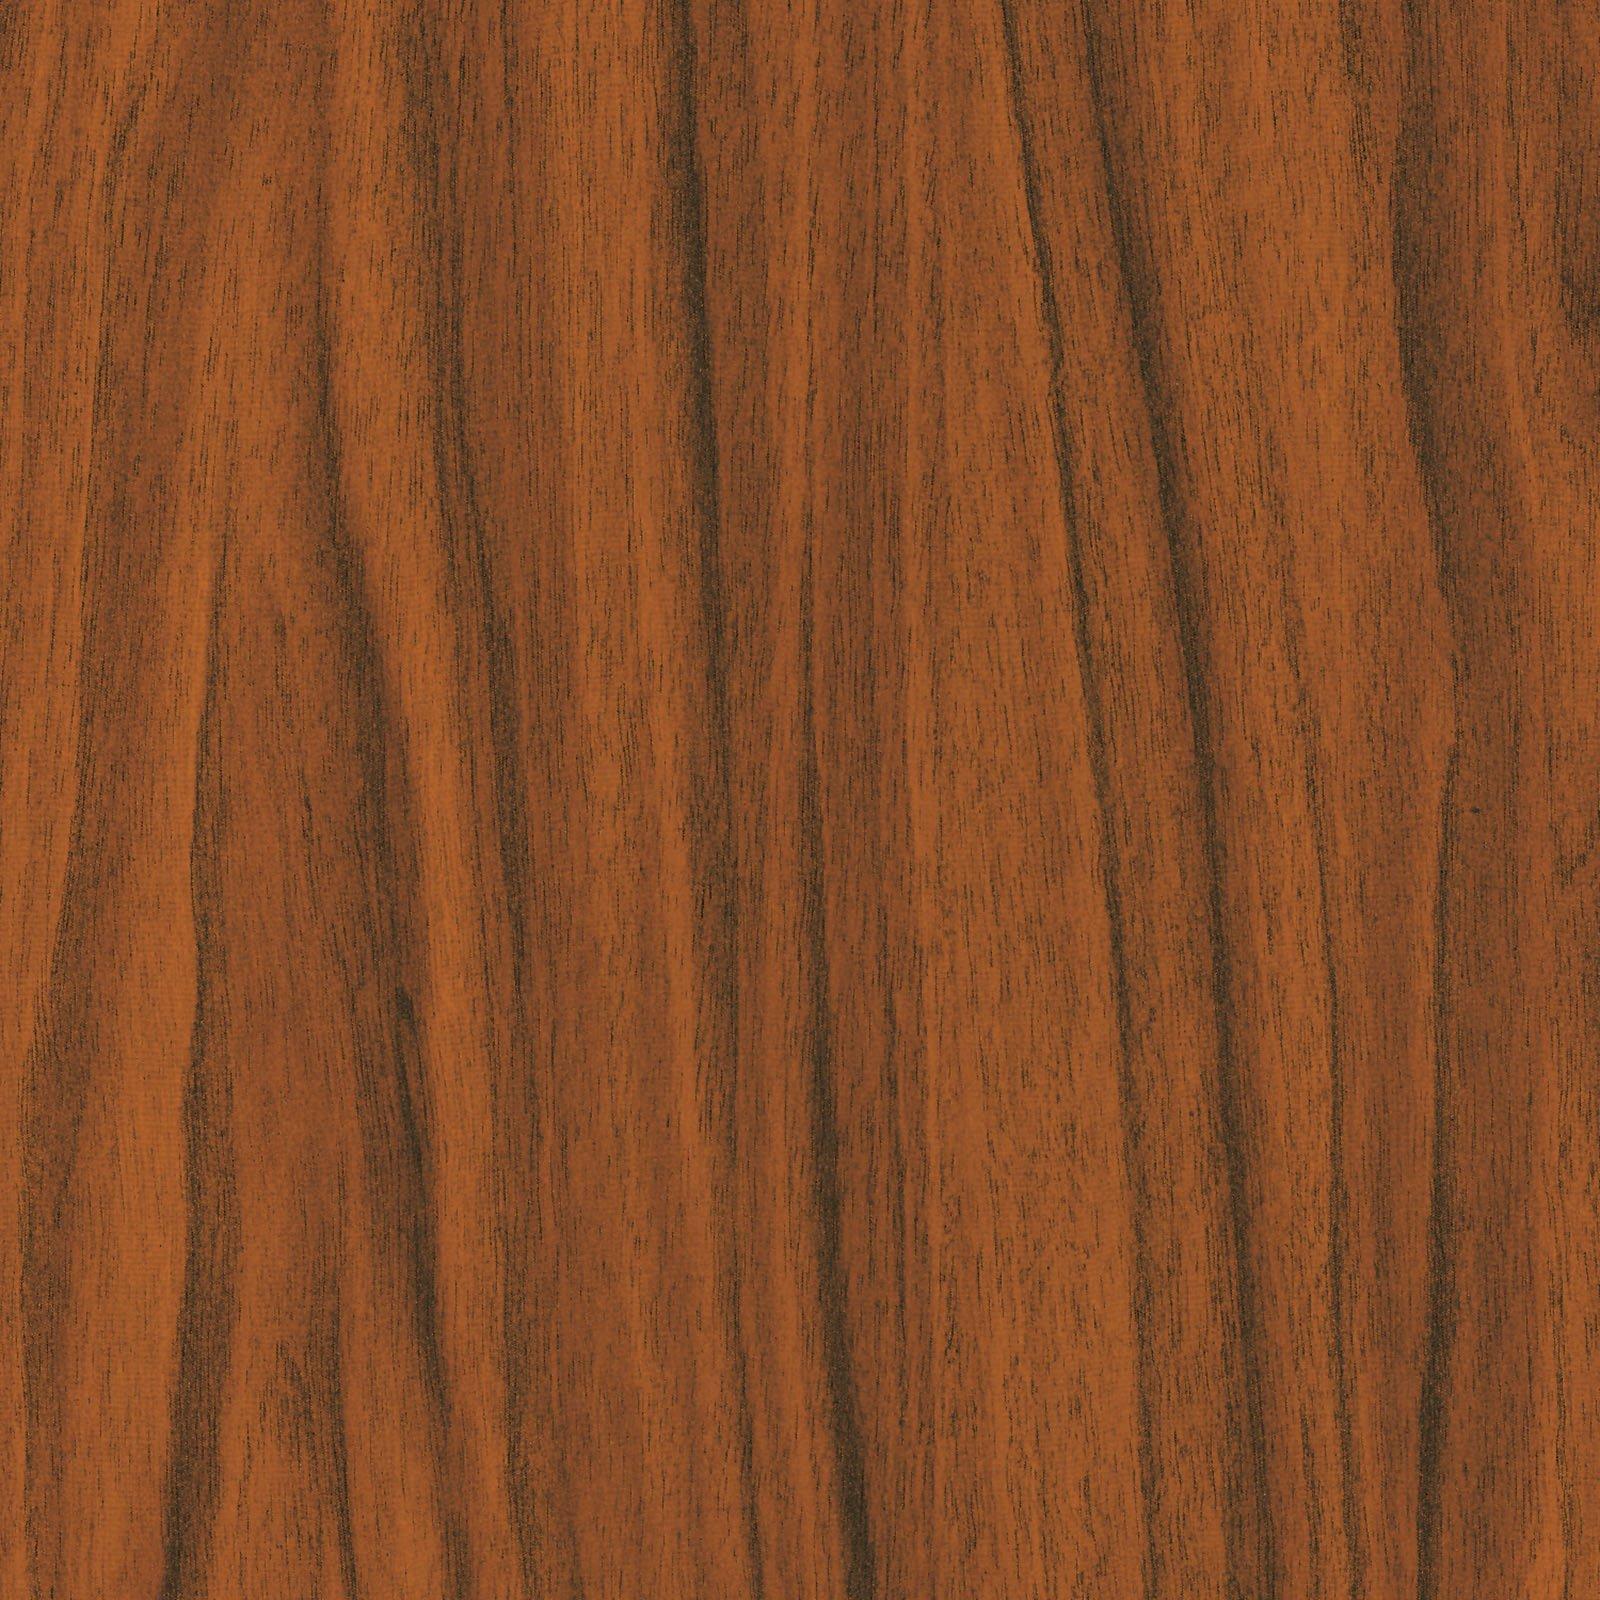 d c fix klebefolie braun nussbaum 67 5x200 cm dekor m belfolie klebefolie. Black Bedroom Furniture Sets. Home Design Ideas